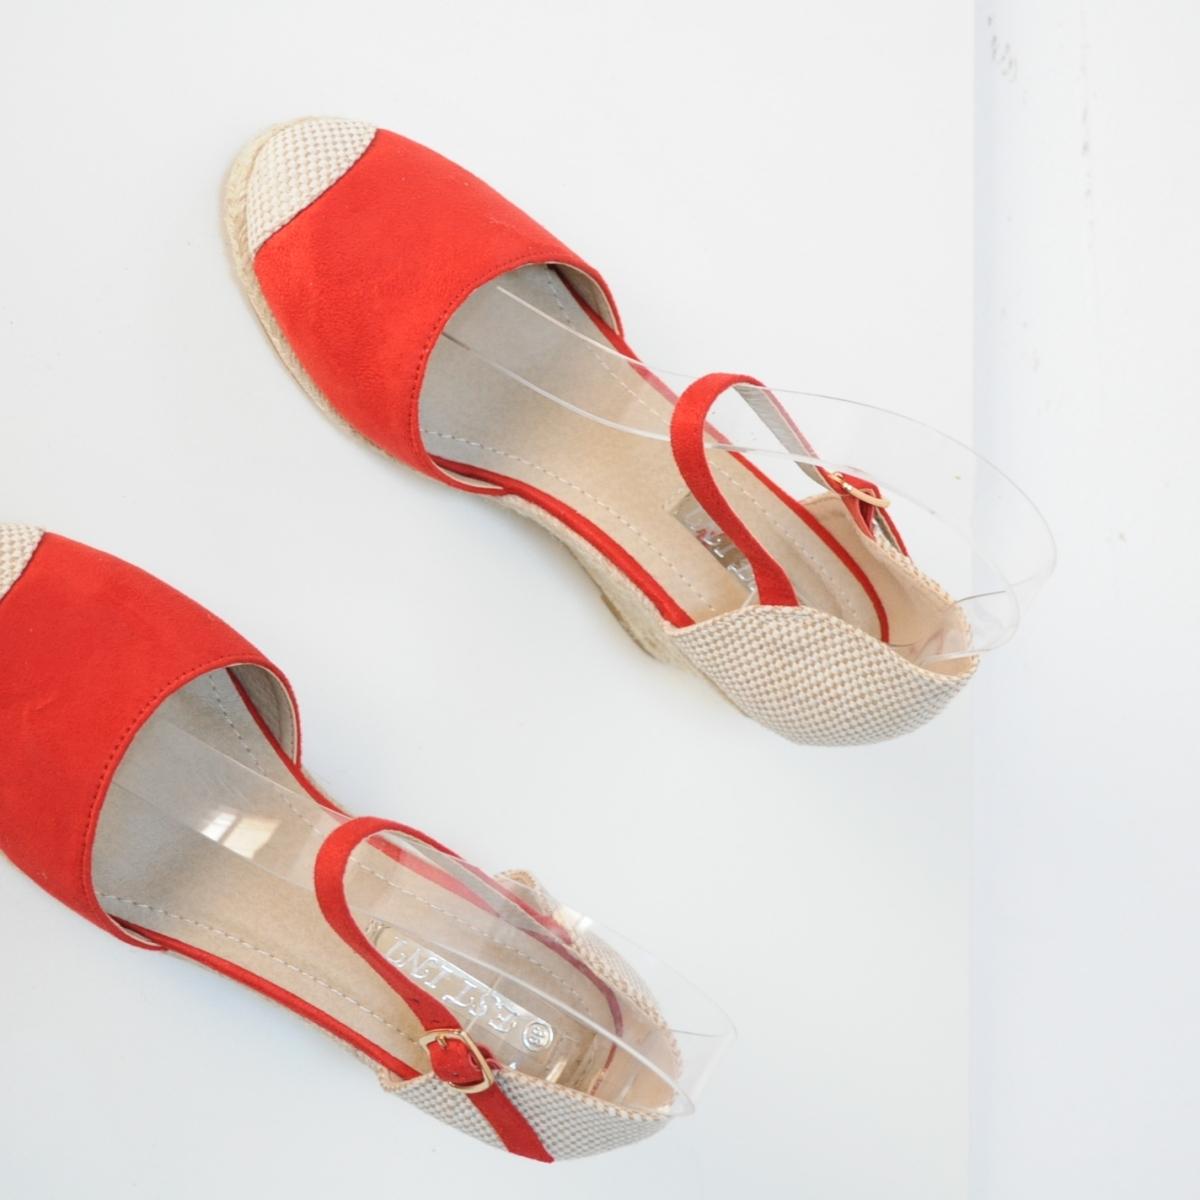 Sandale Erika rosii cu platforma